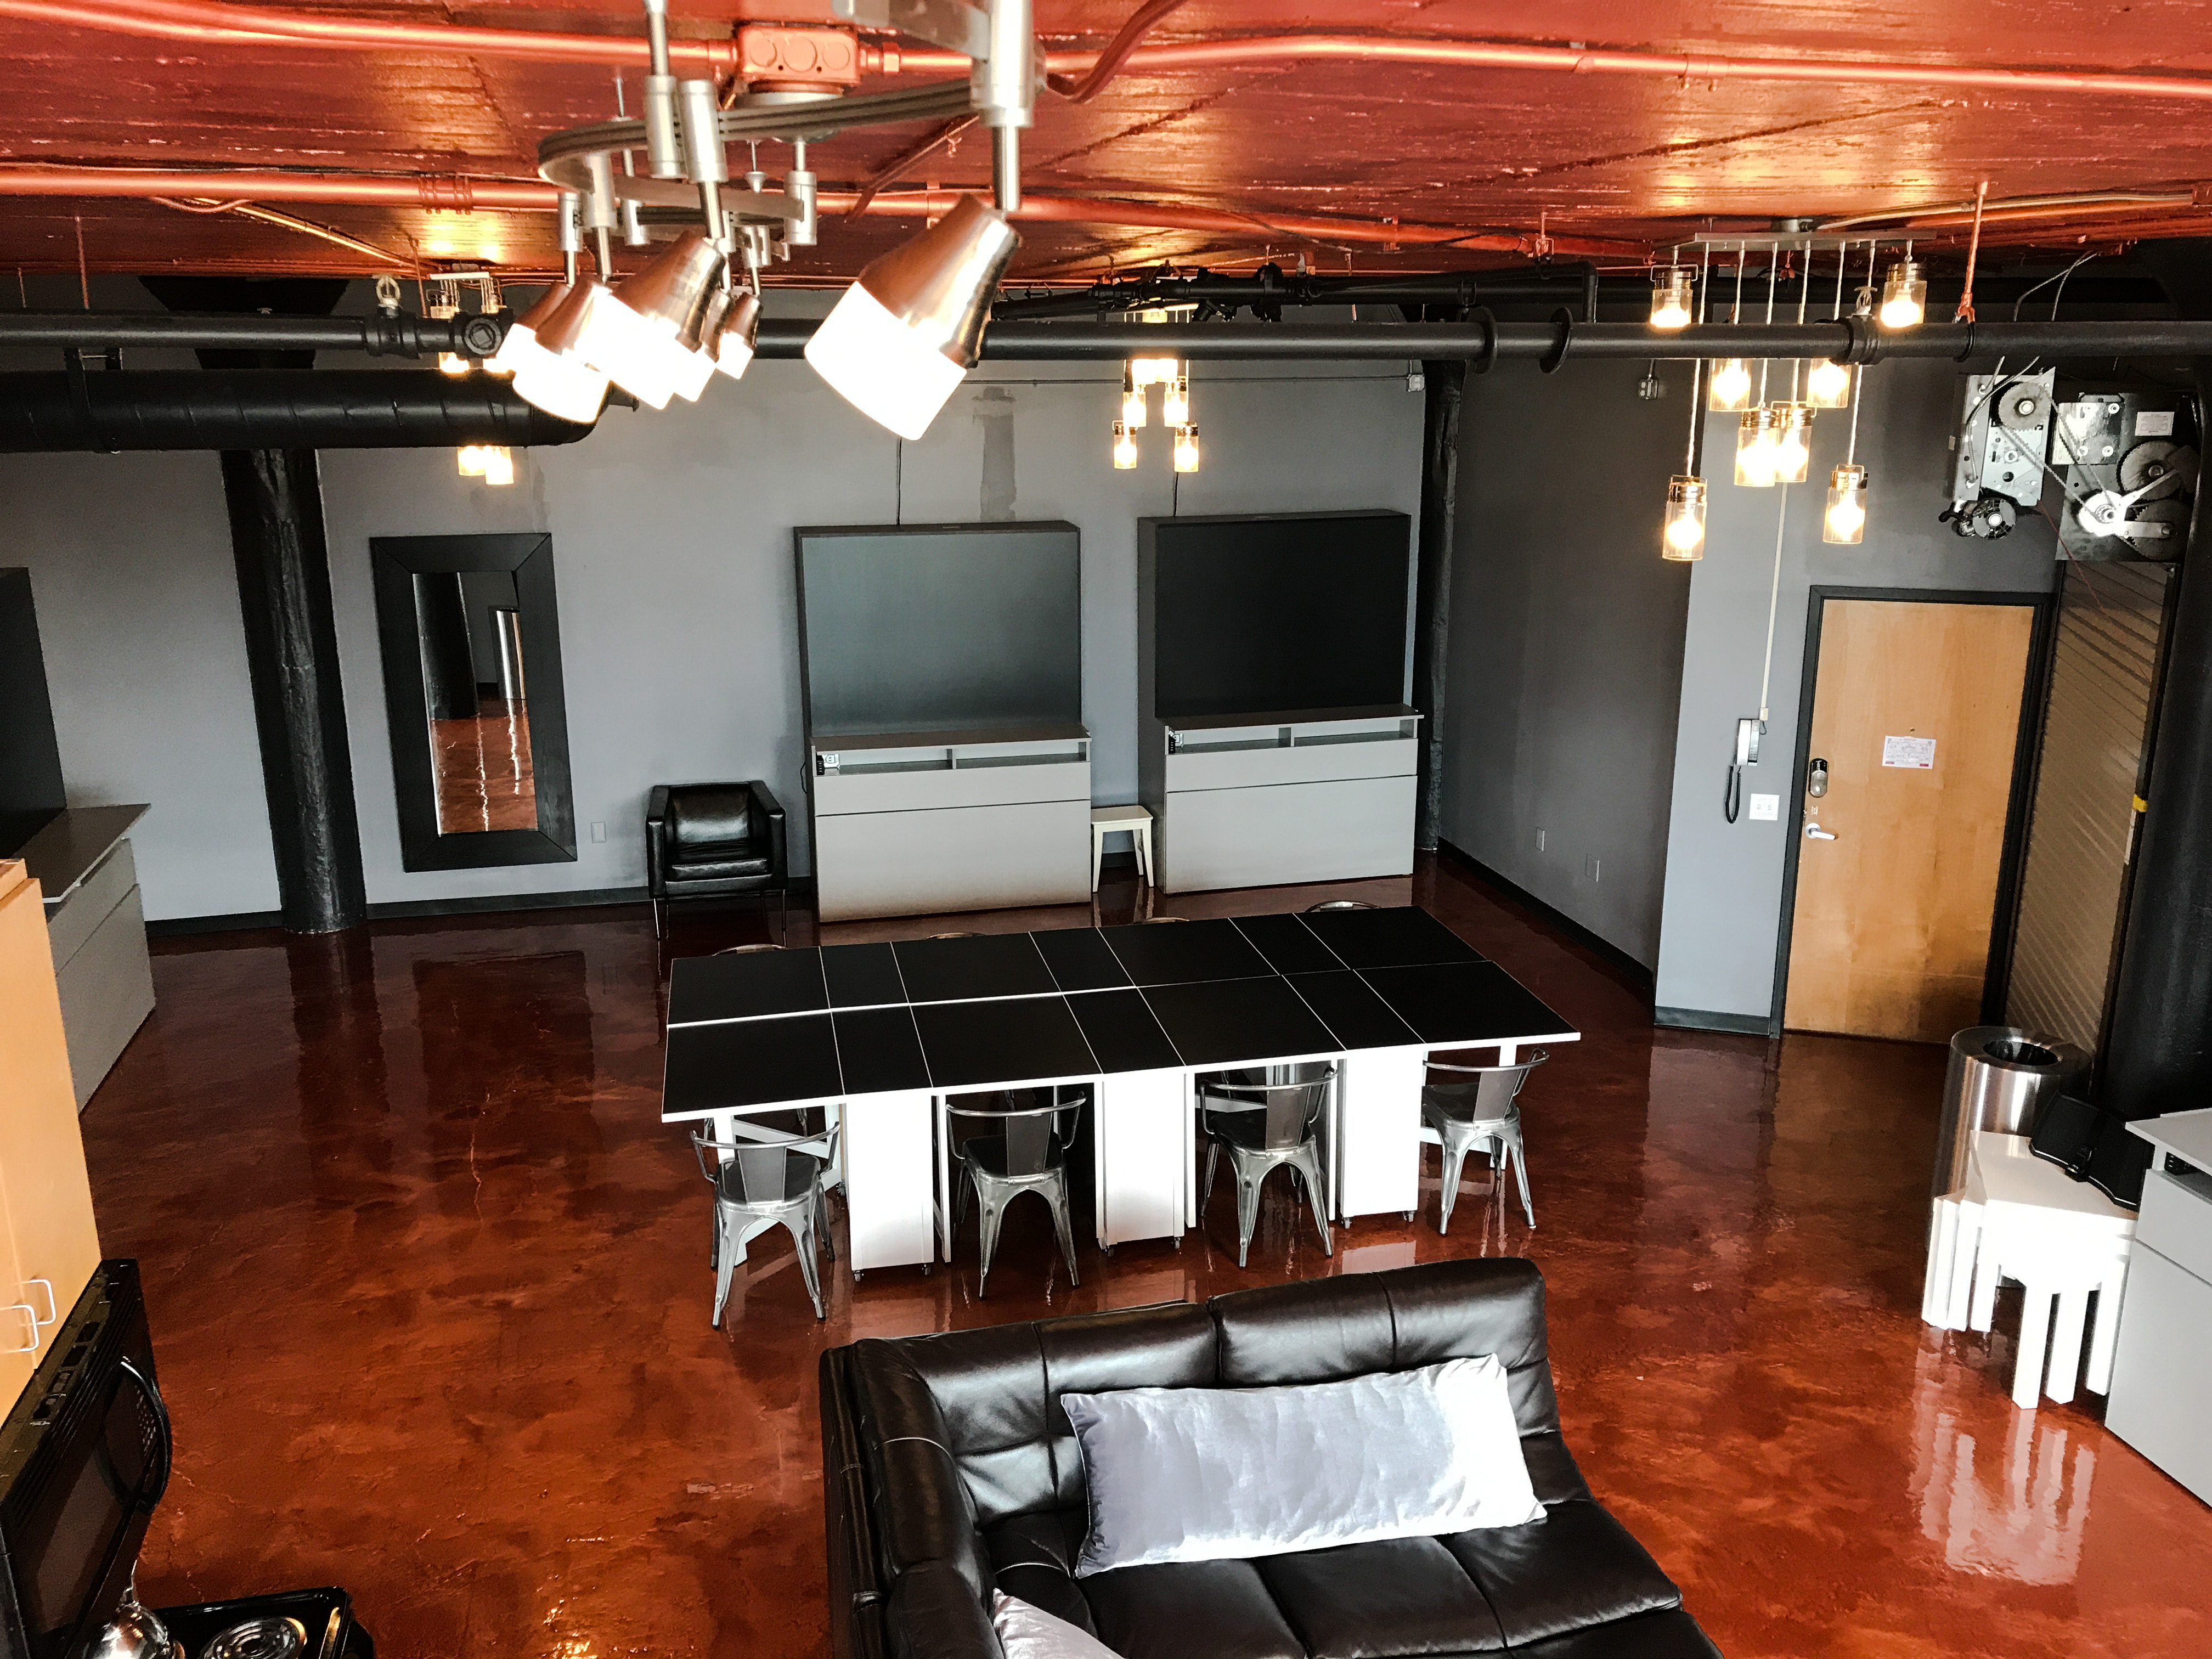 Loft Reverie Hotel 714 - Birdseye Dining + Zbeds + Cloud Sofa